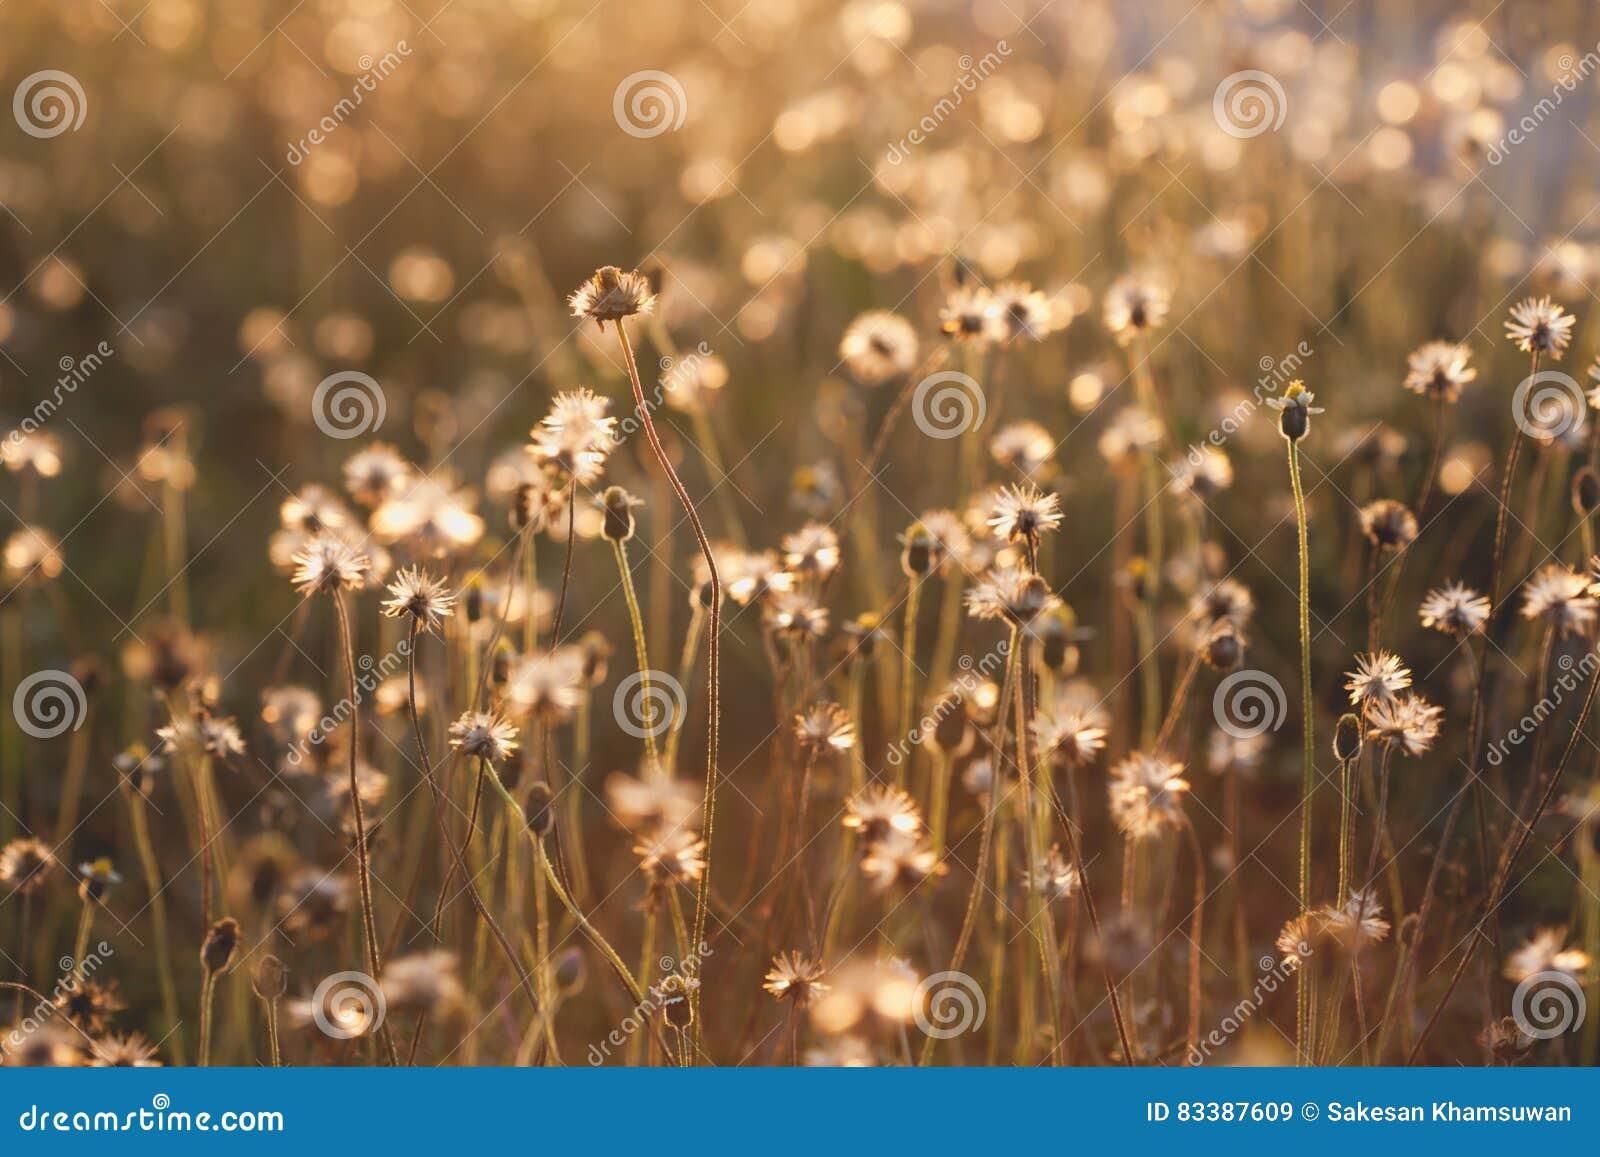 Makro mit extrem flachem DOF der Grasblume im Pastell